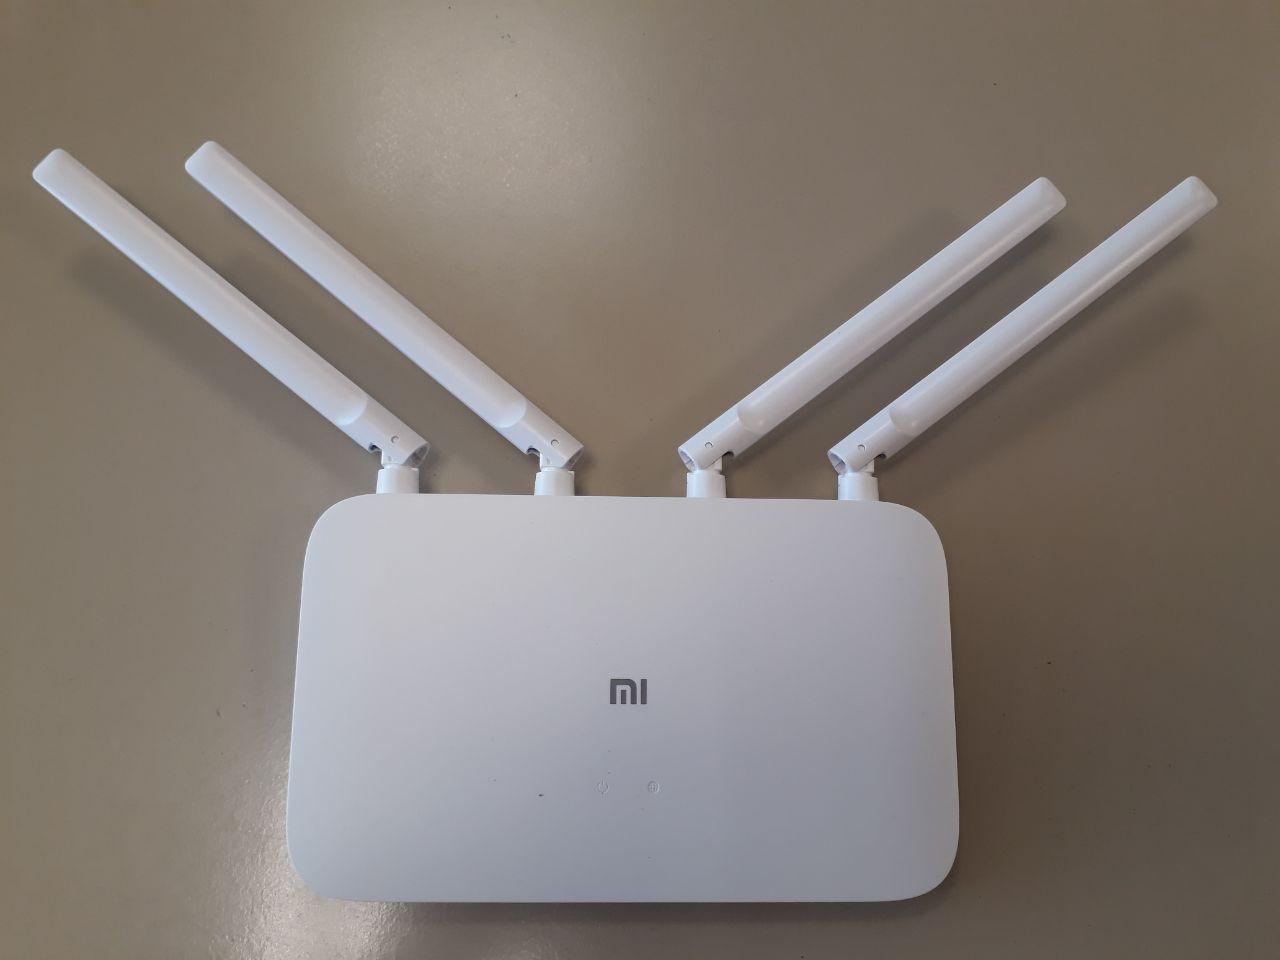 Xiaomi Mi Router 4A Gigabit Edition (R4AG/R4A Gigabit): fully